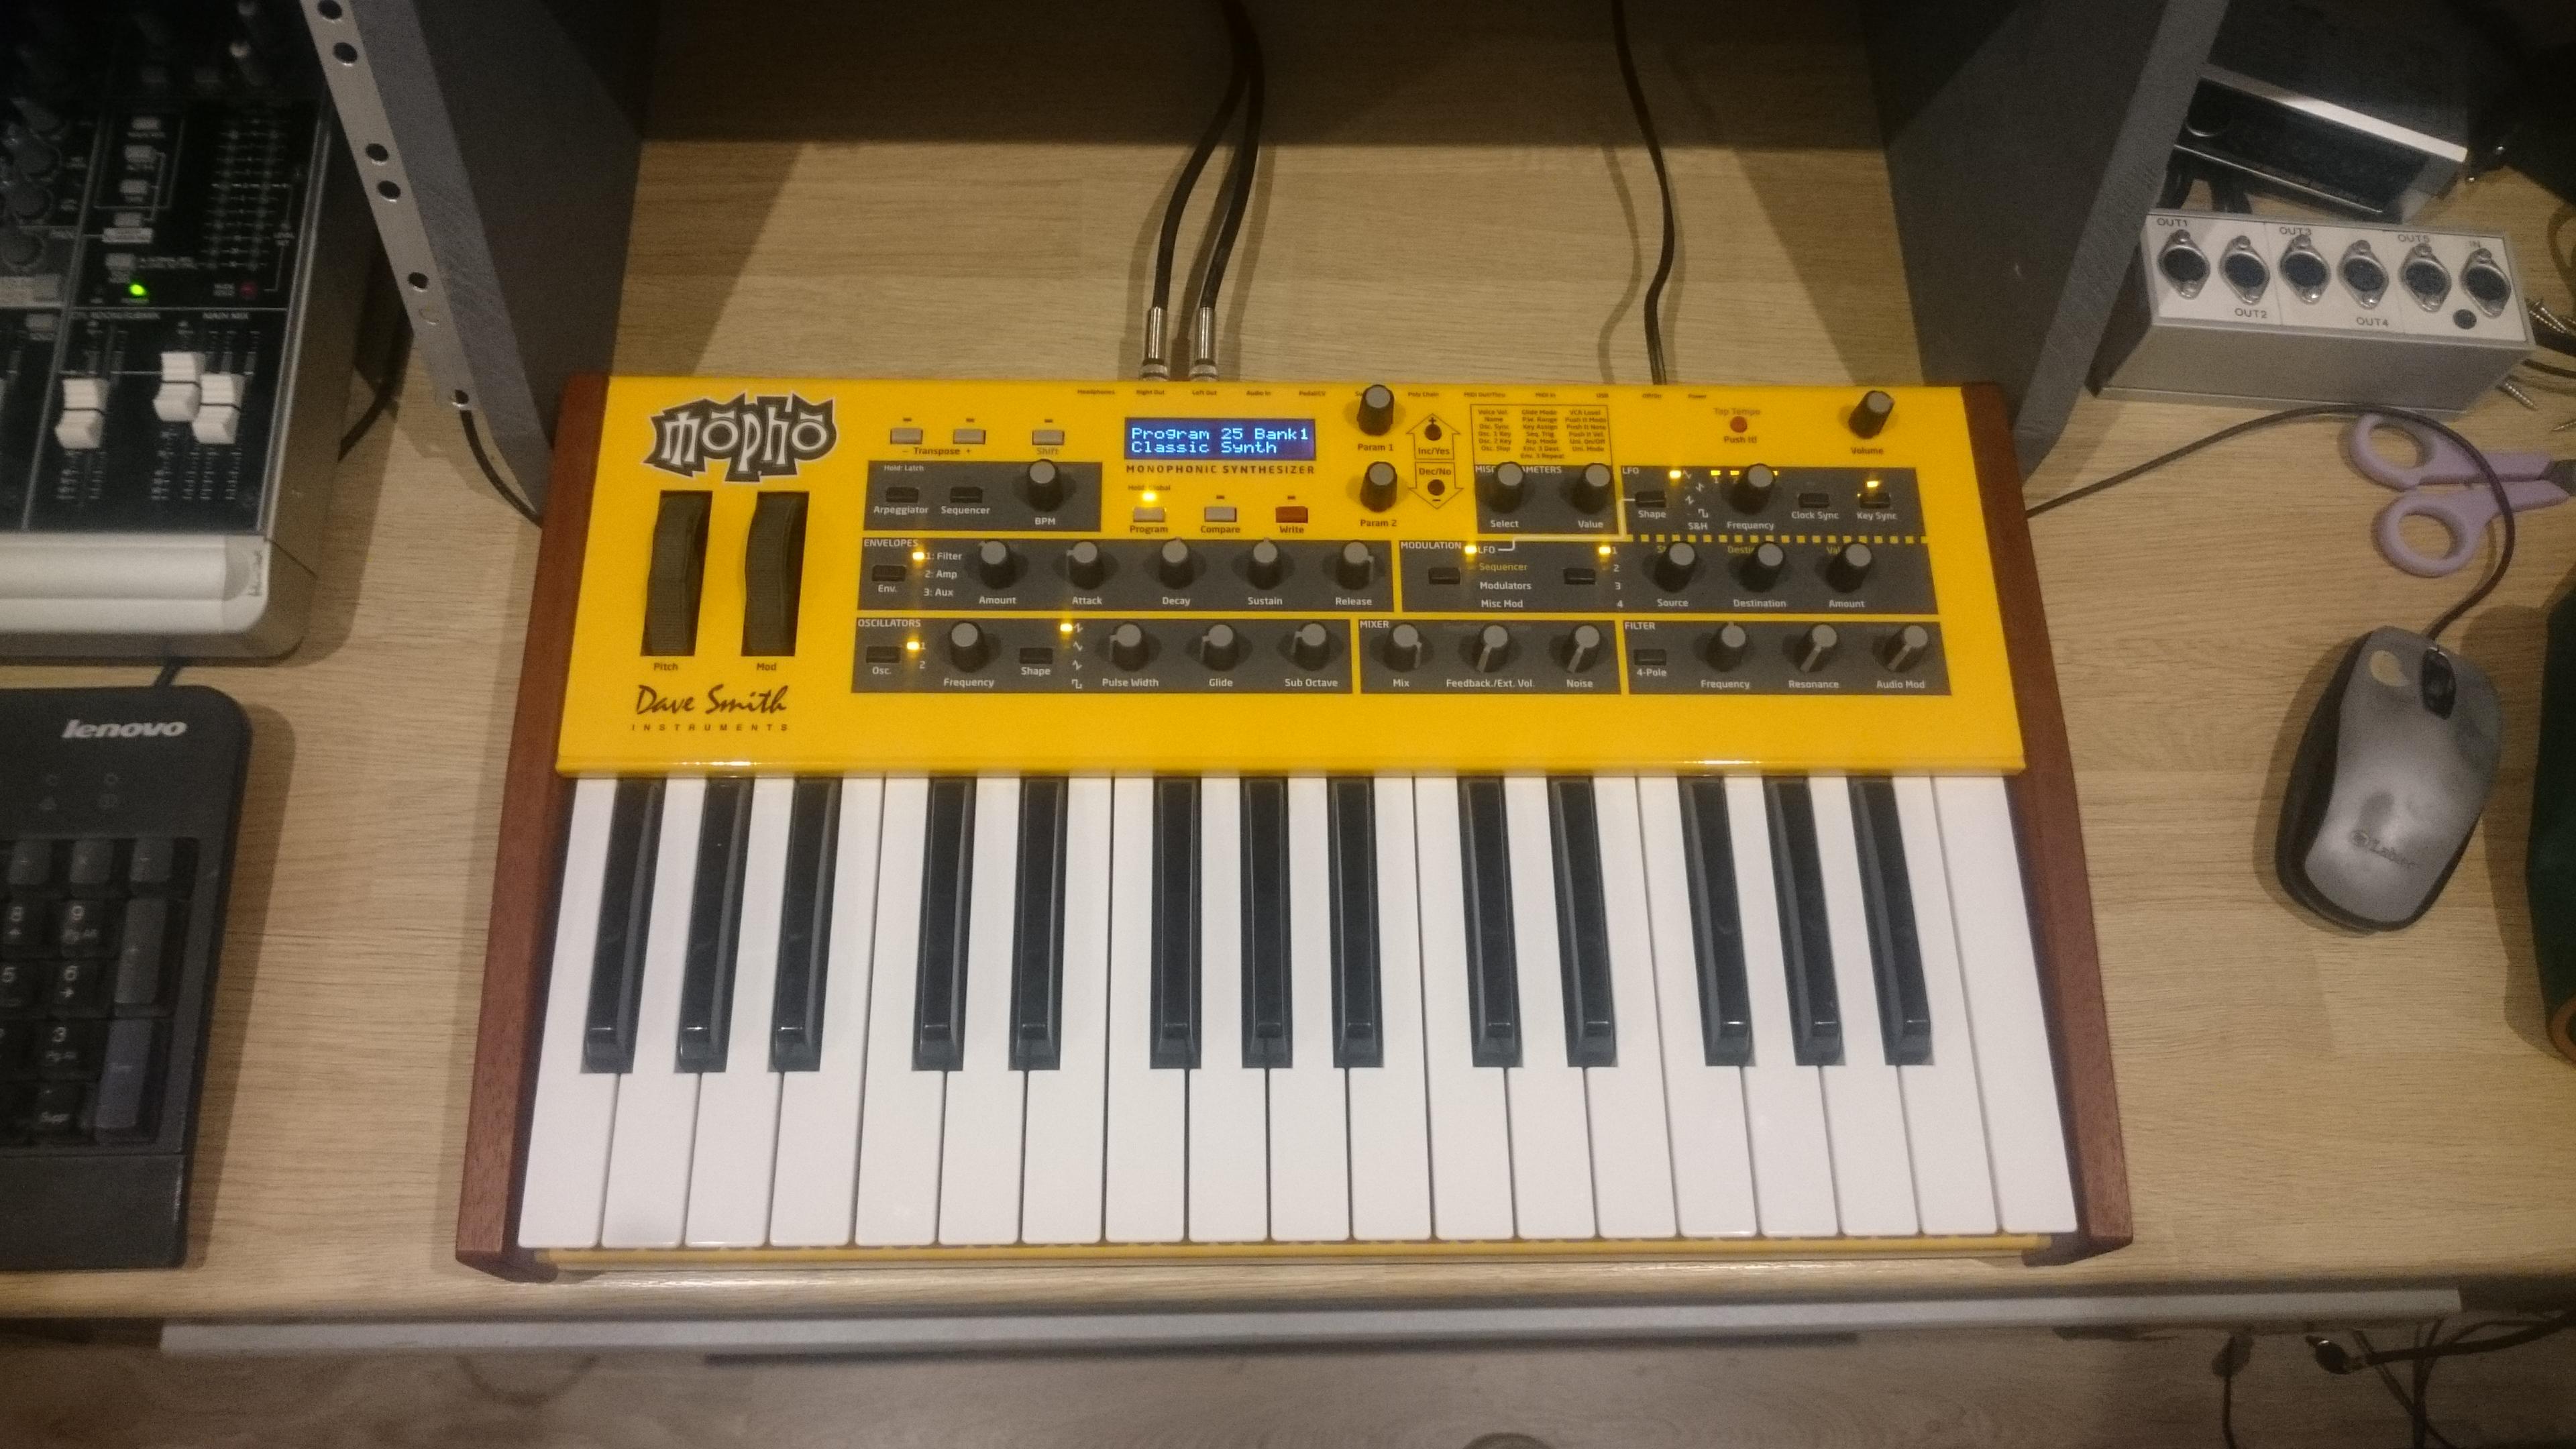 mopho keyboard dave smith instruments mopho keyboard audiofanzine. Black Bedroom Furniture Sets. Home Design Ideas